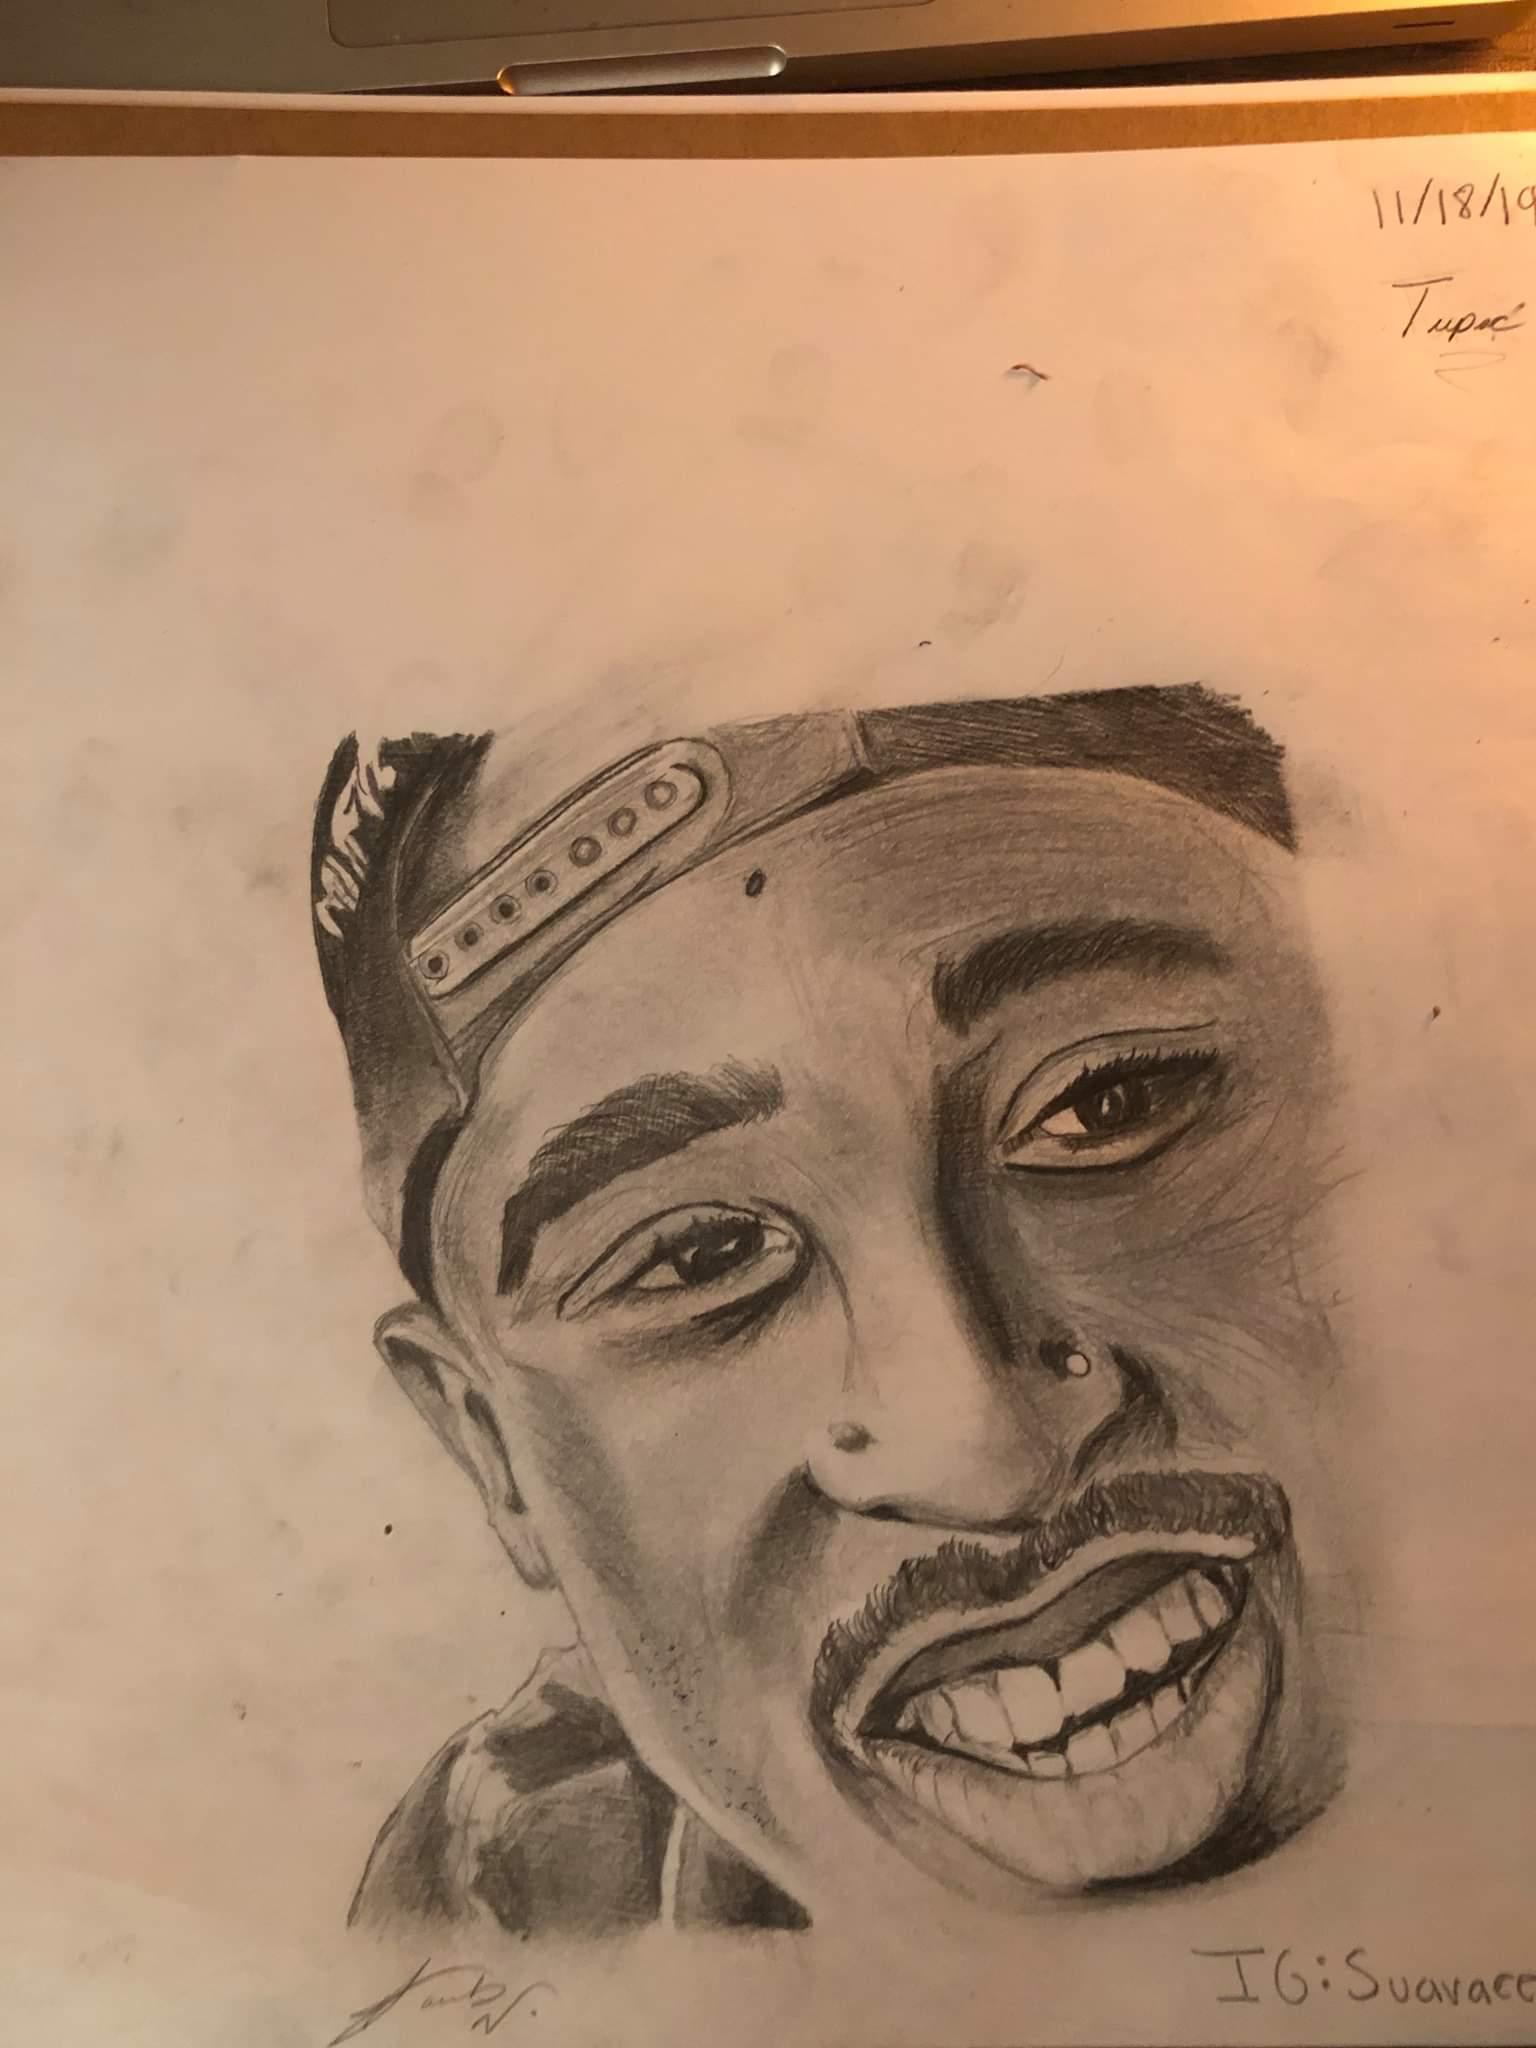 Tupac Shakur drawing